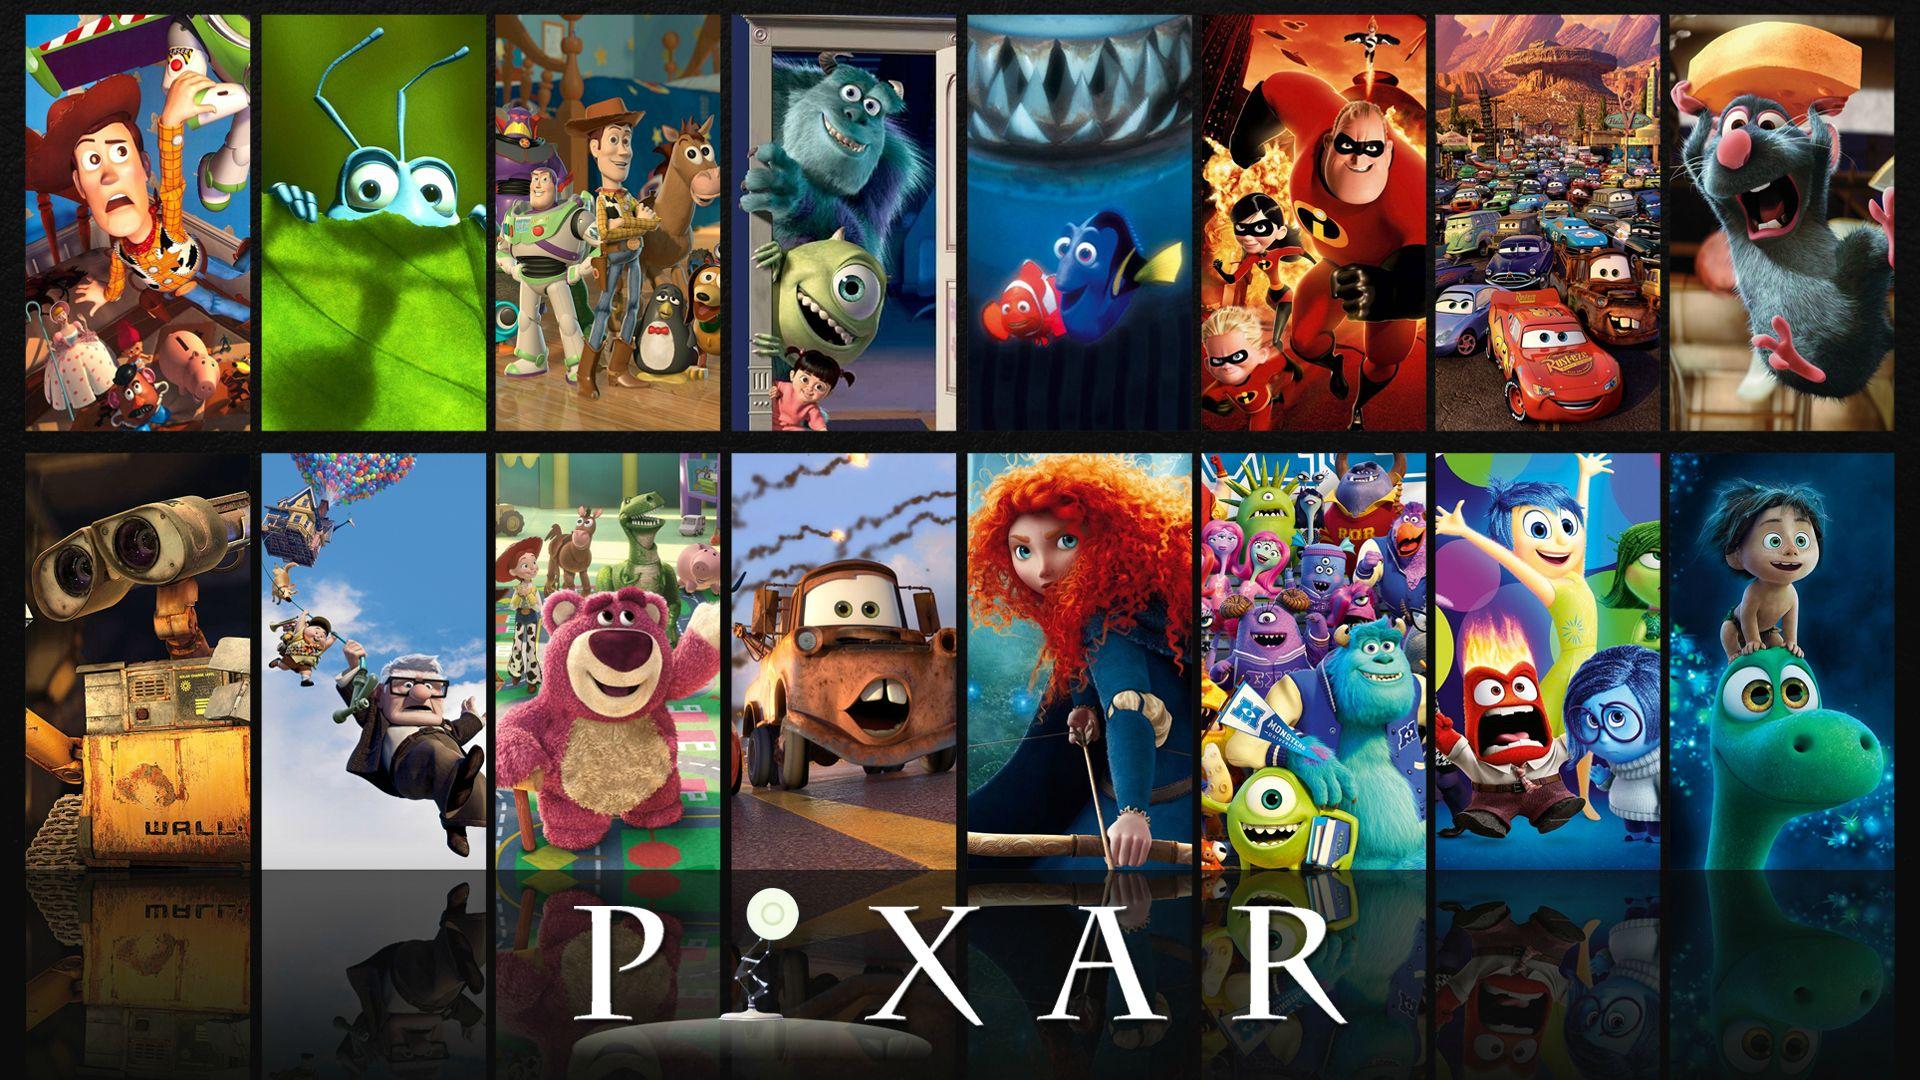 Pixar universe theory